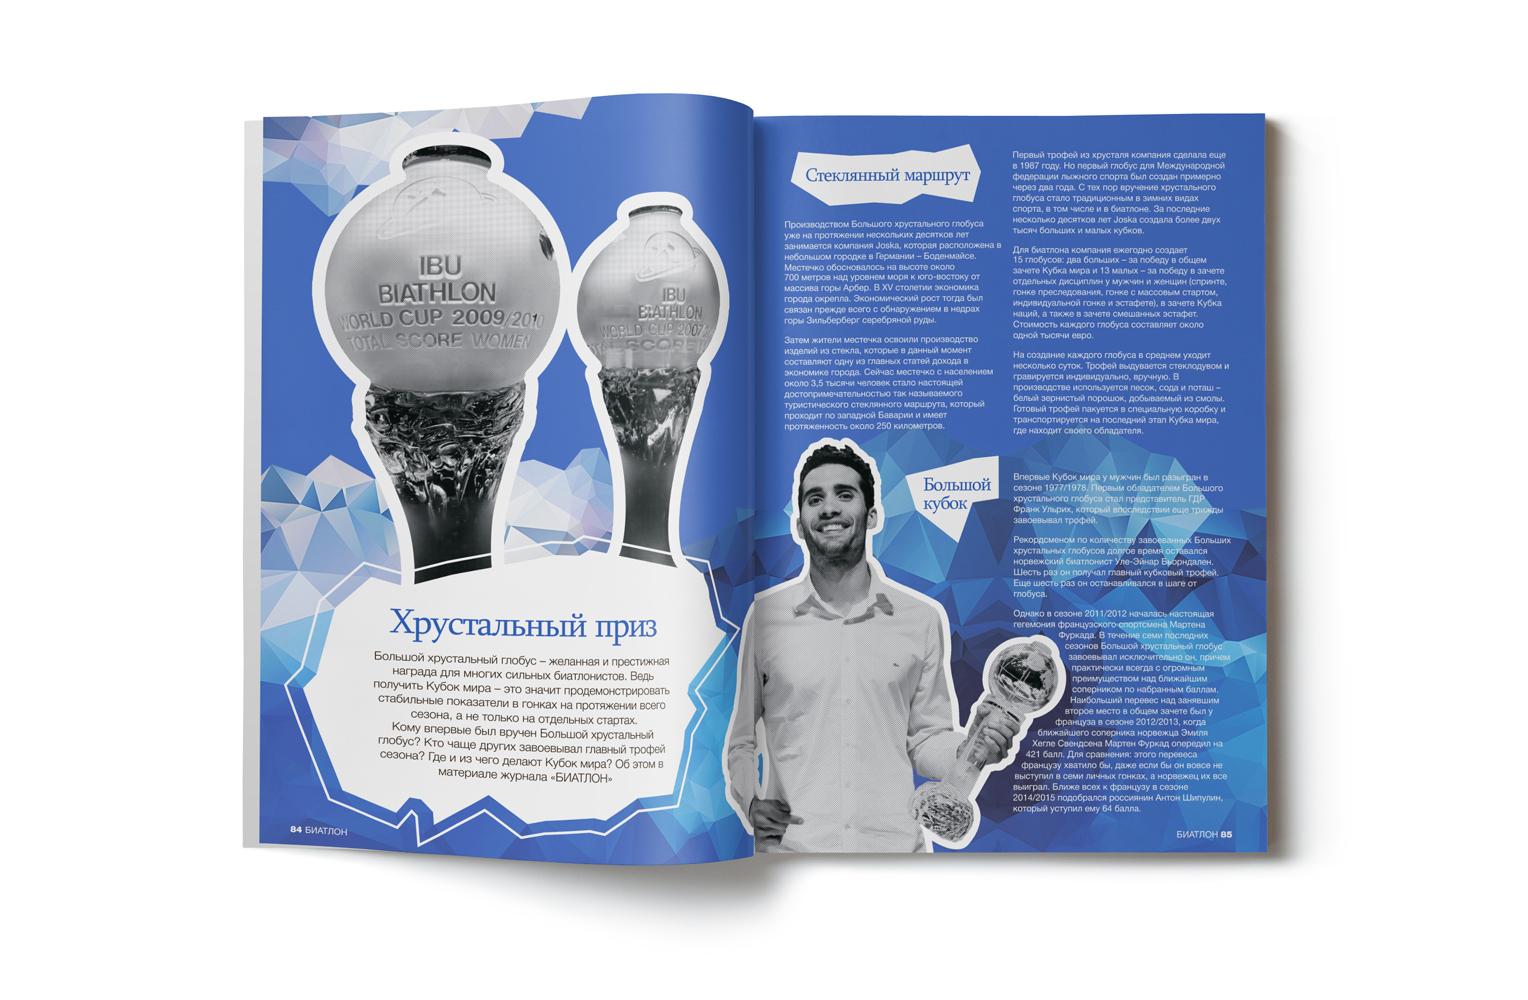 biathlon-magazine-pages-6